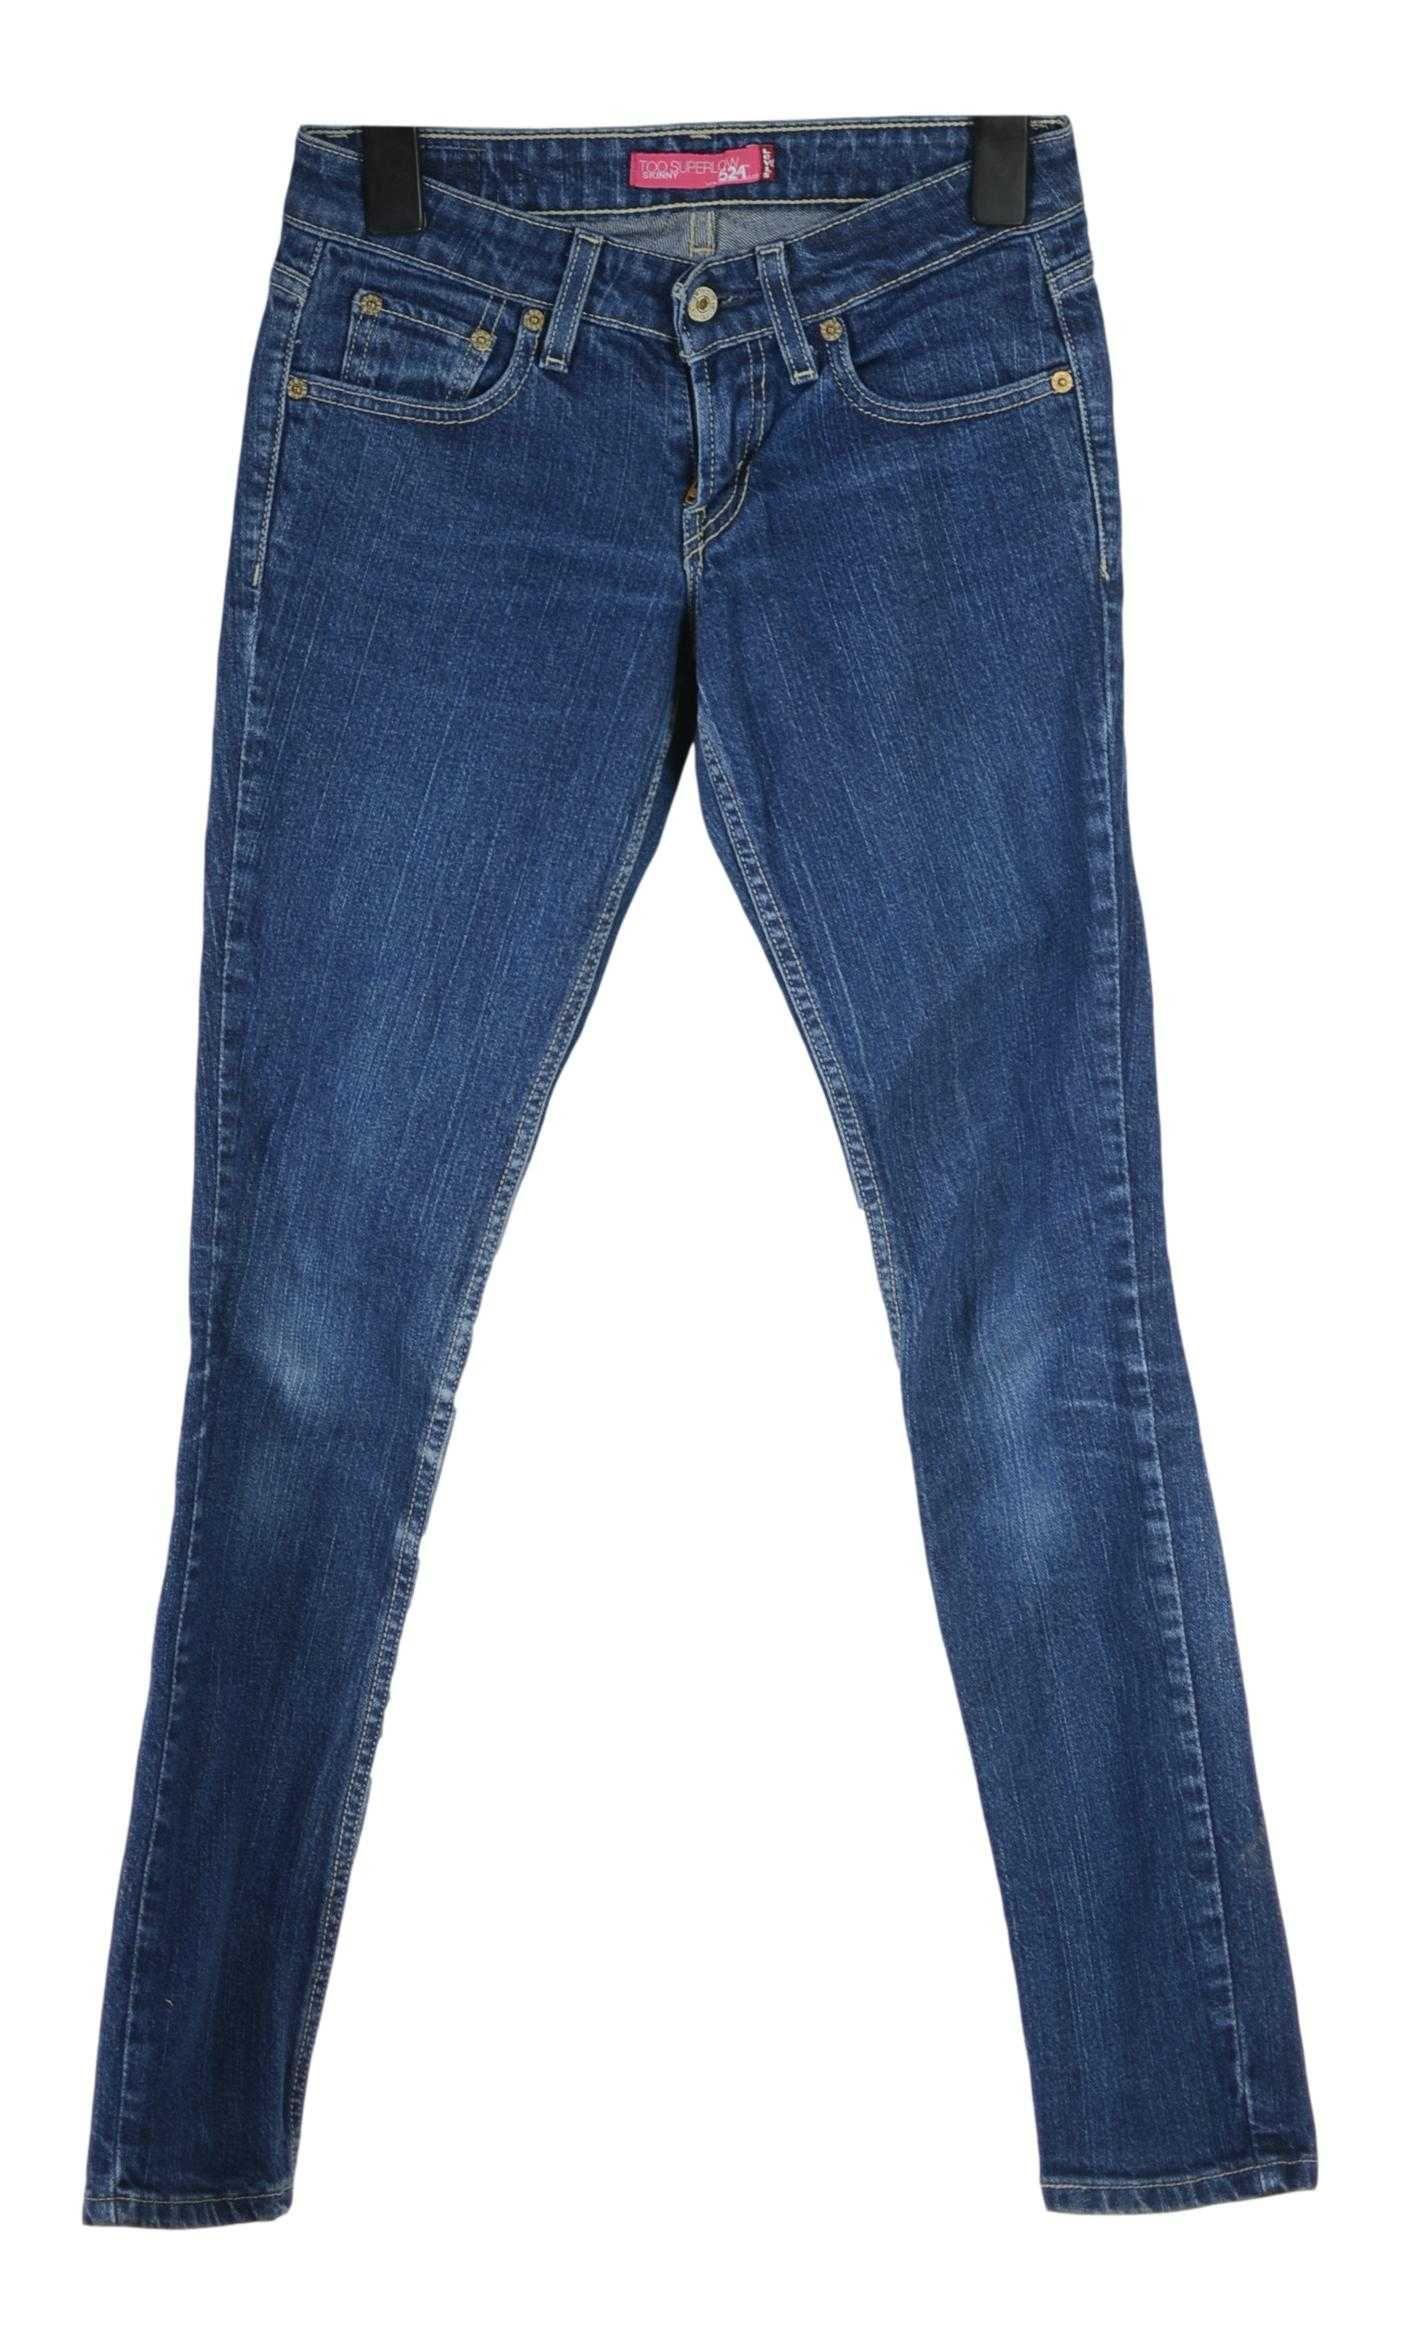 Blugi Dama Levi's 524 Skinny Slim Low marimea W26 L30 Bumbac AO68